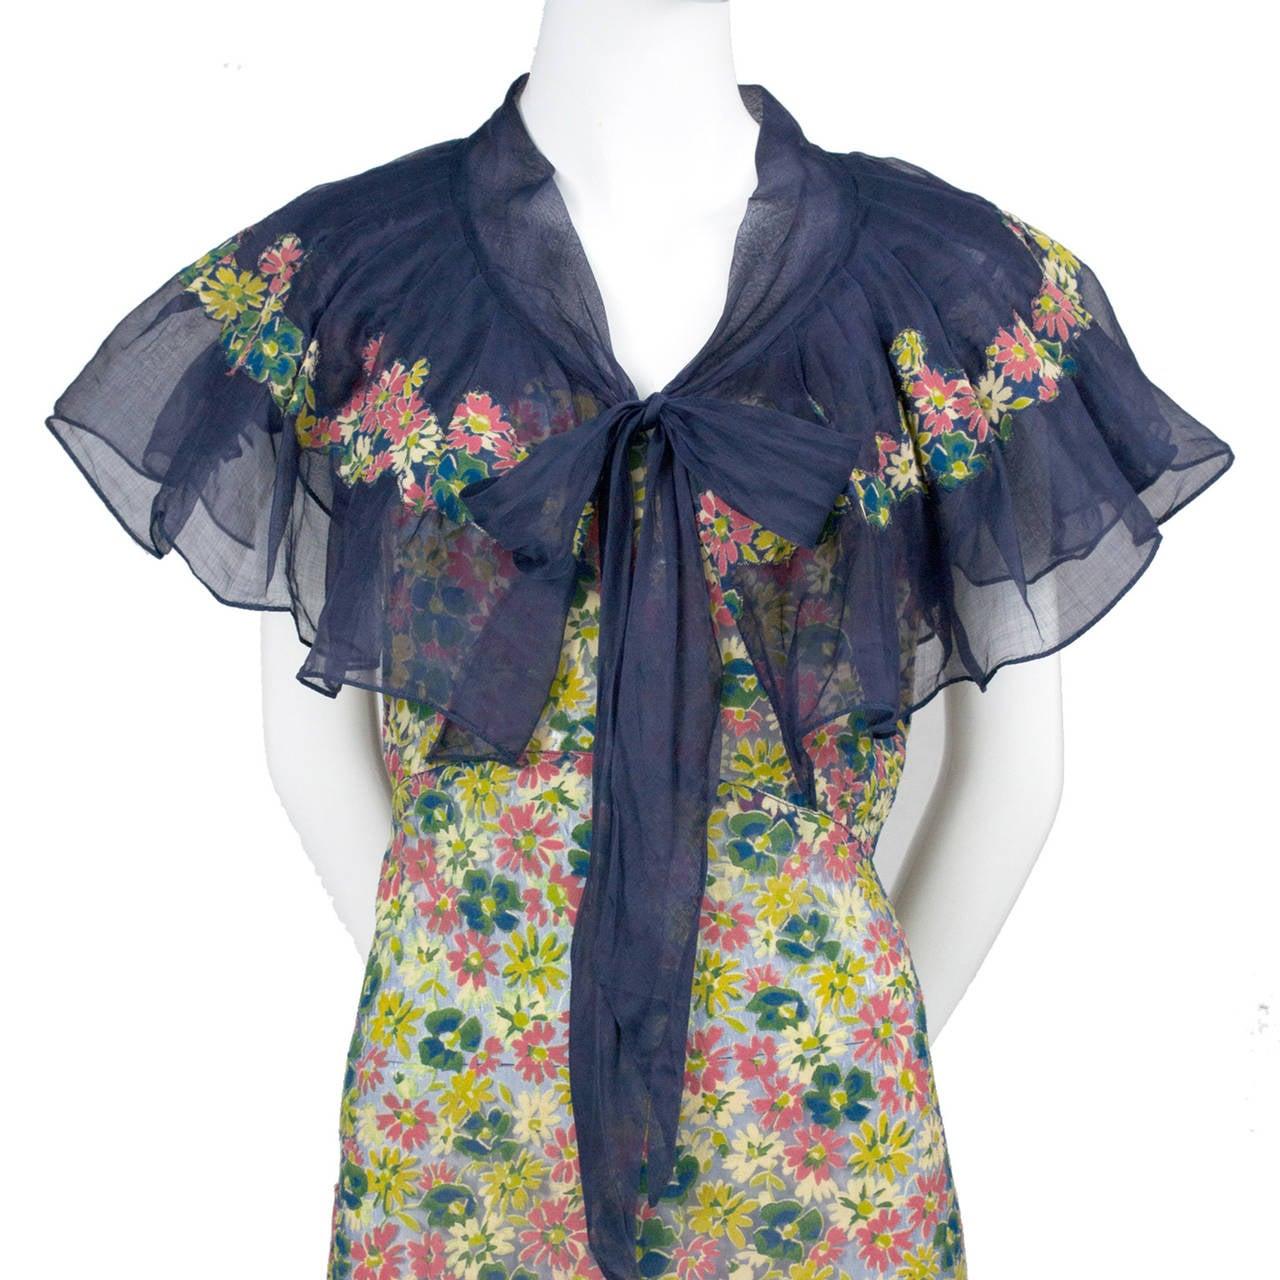 Rare 1930s Vintage Chanel Adaptation Dress Floral Velvet Applique Silk Organza 3